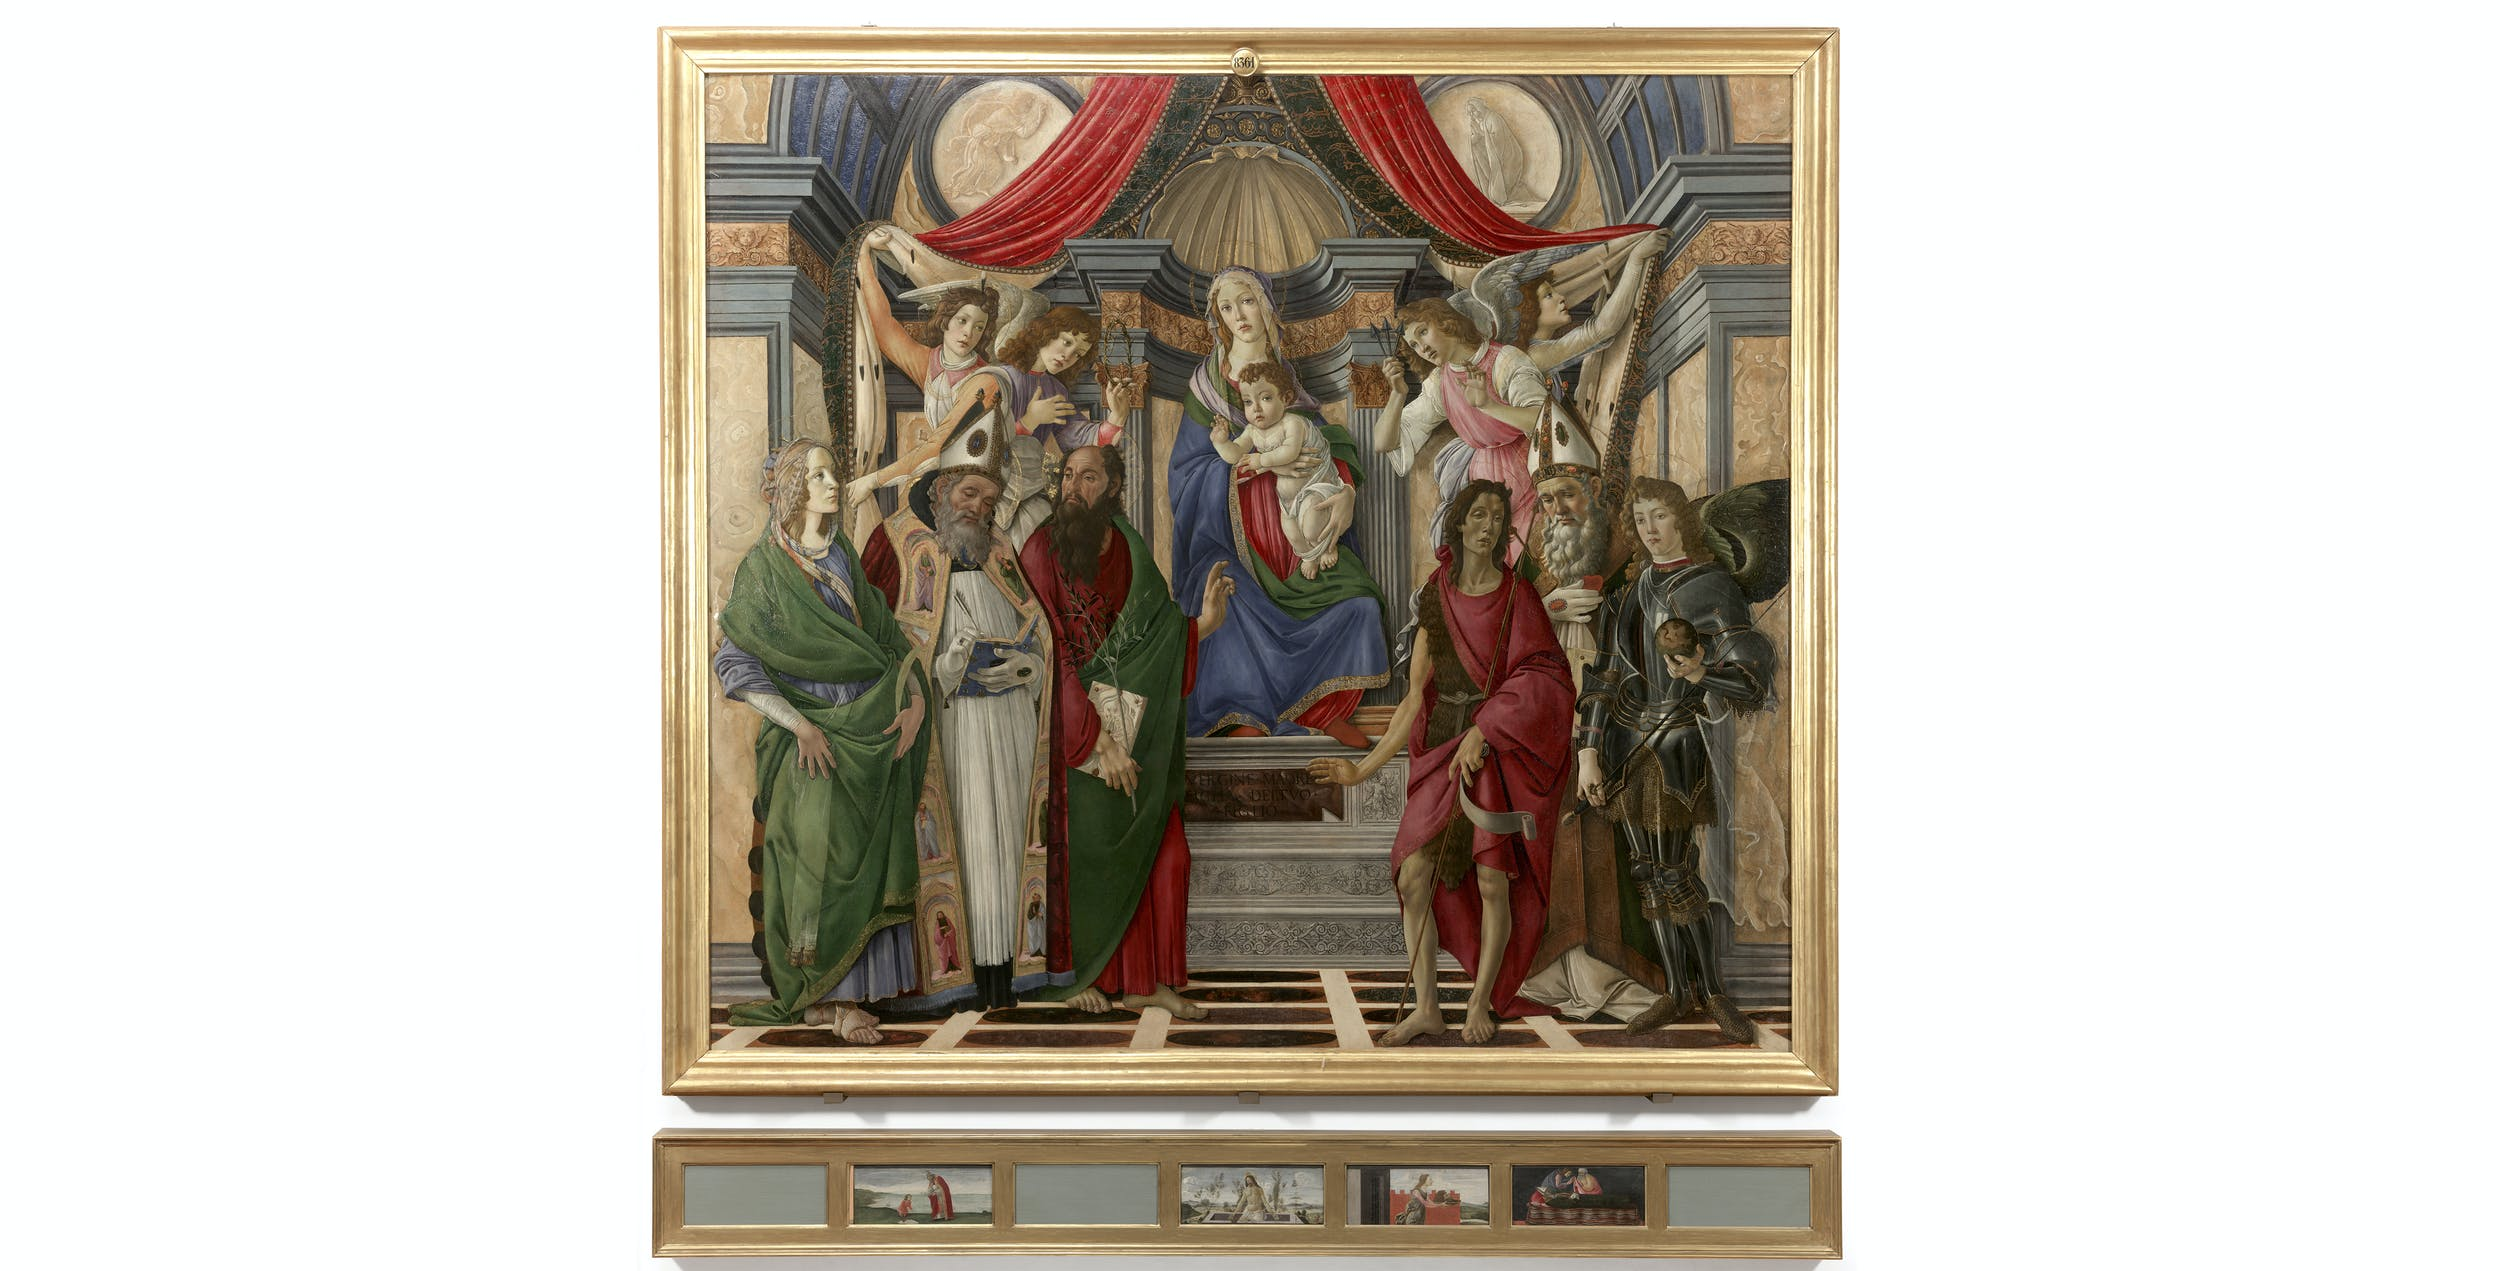 Sandro Botticelli, Pala di San Barnaba, Uffizi